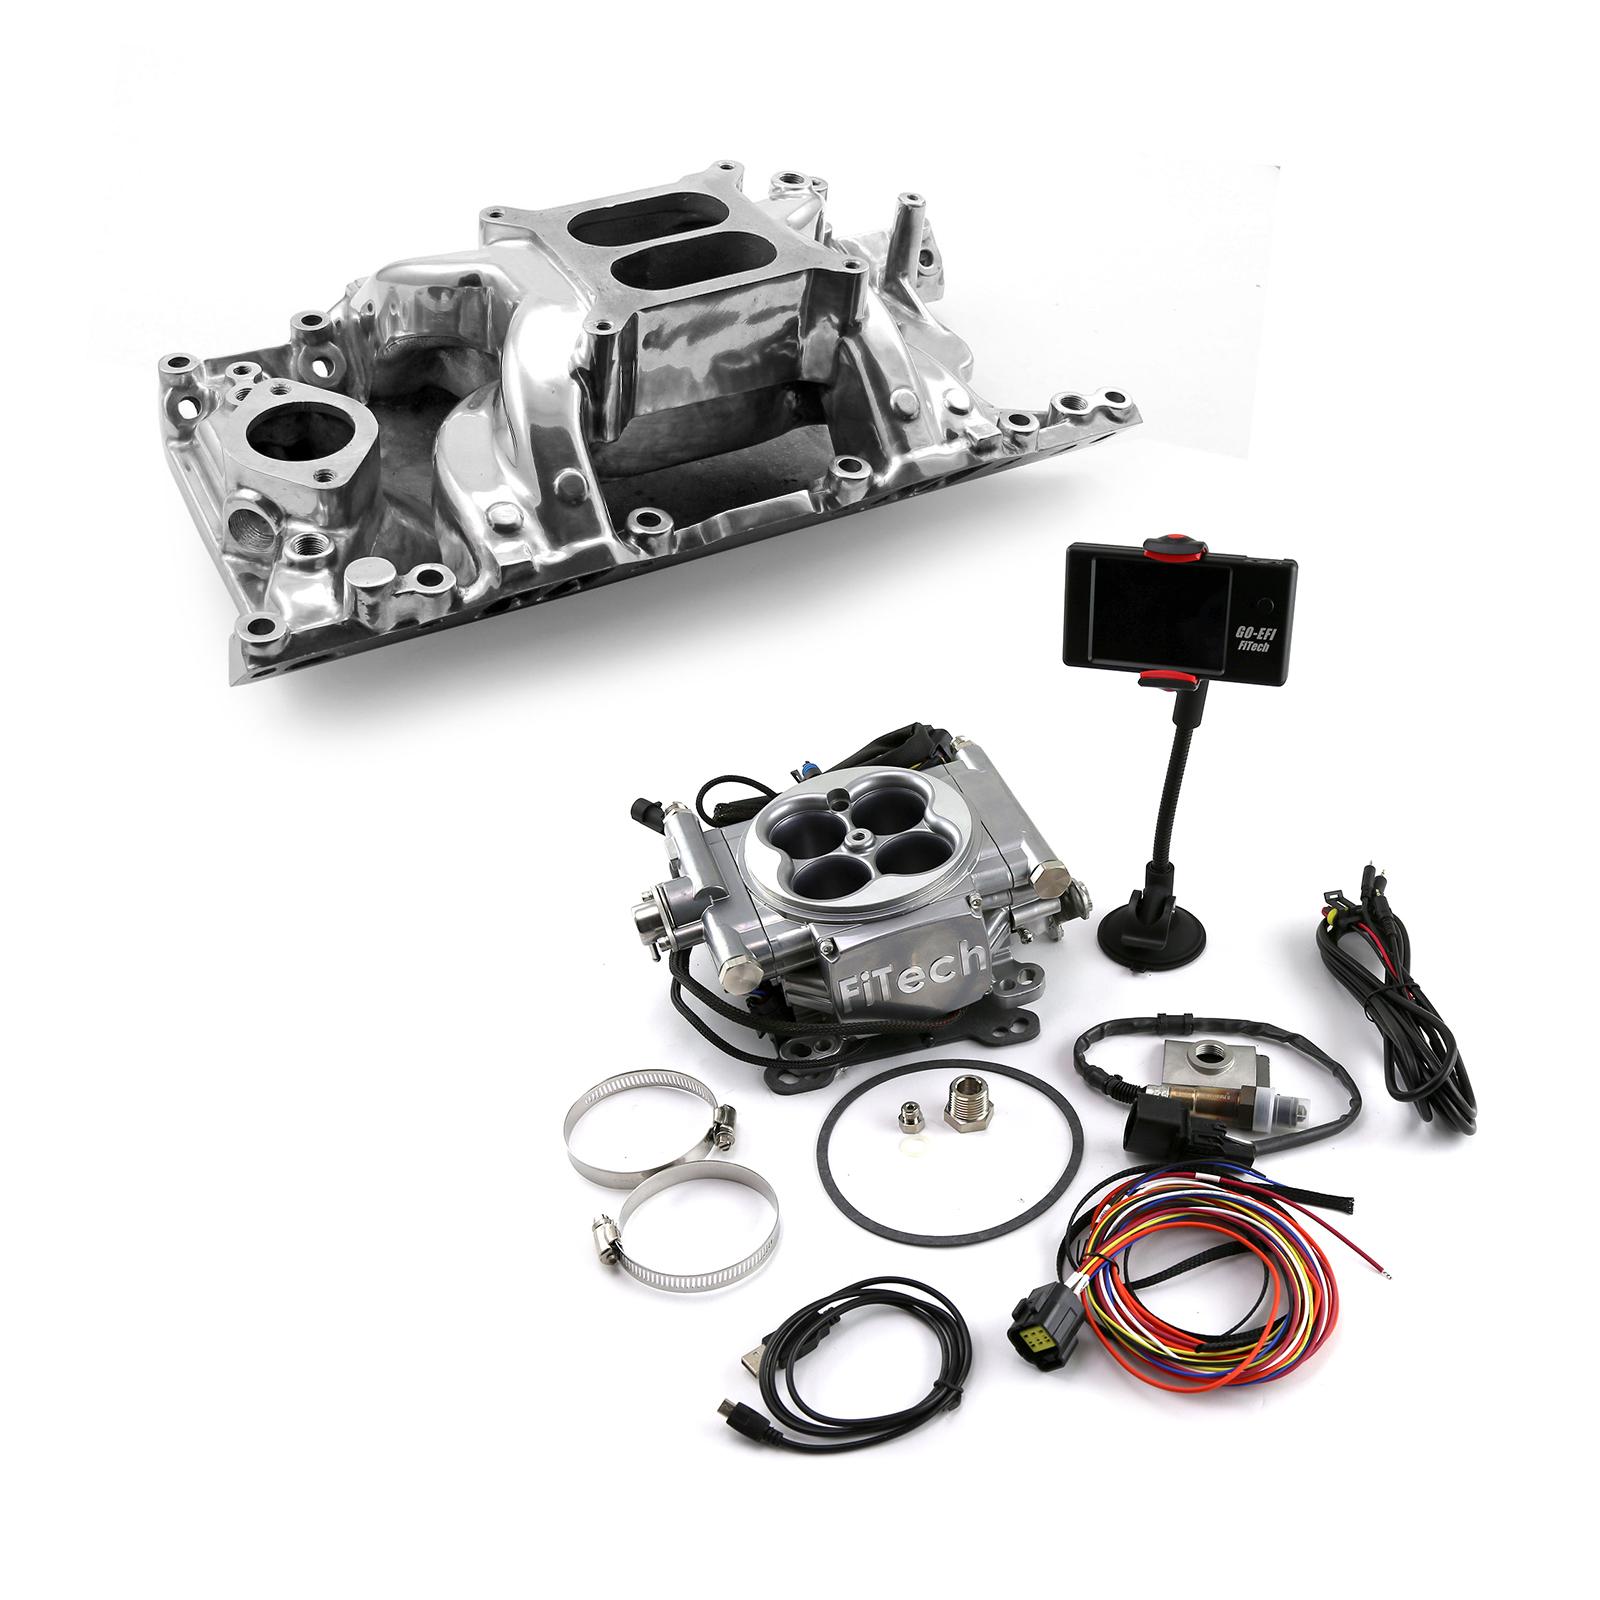 Mopar Chrysler SB 318 360 Manifold & FiTech Go EFI 30001 Fuel Injection